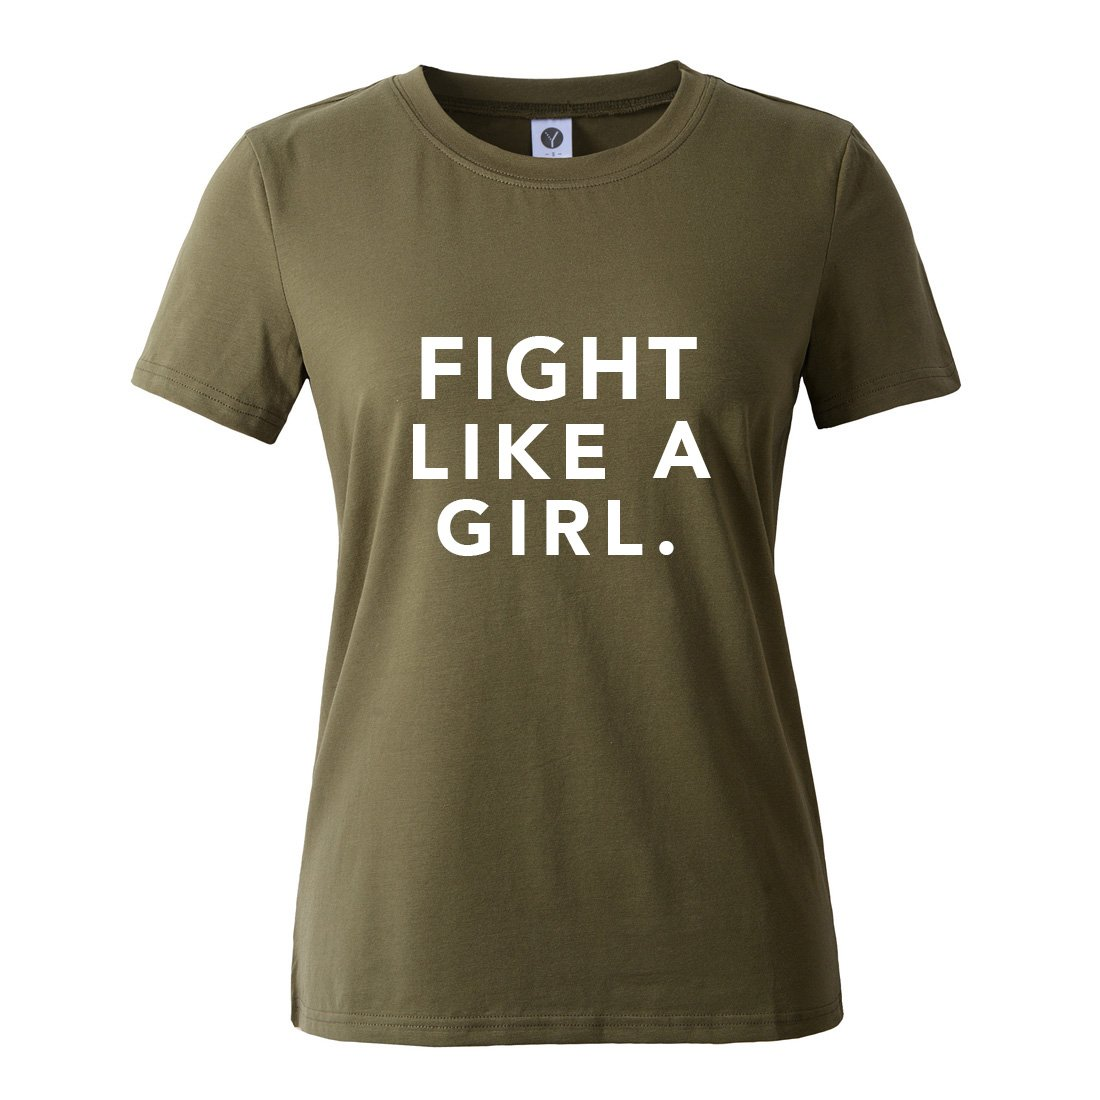 BLACKMYTH Mujer Casual Camisetas para Estampar Redondo Graphic Tees Manga Corta Se/ñoras T-Shirt